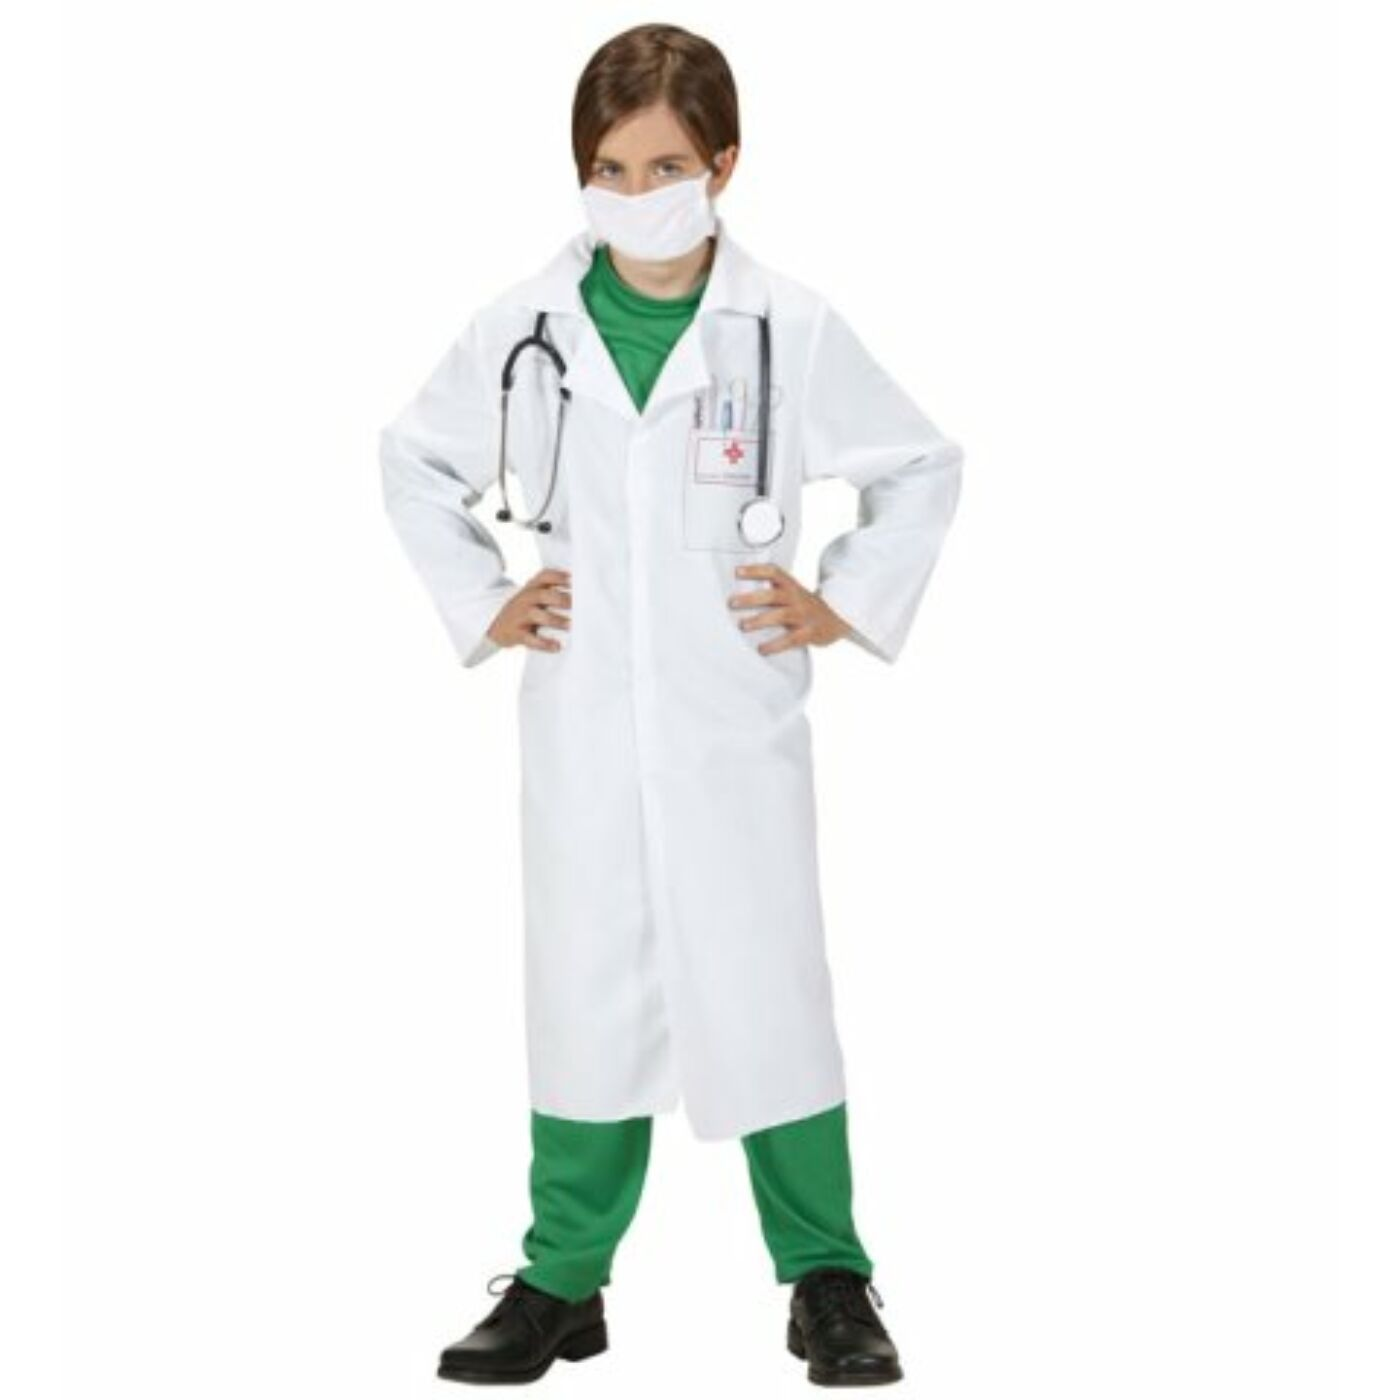 Doktor jelmez 128-as